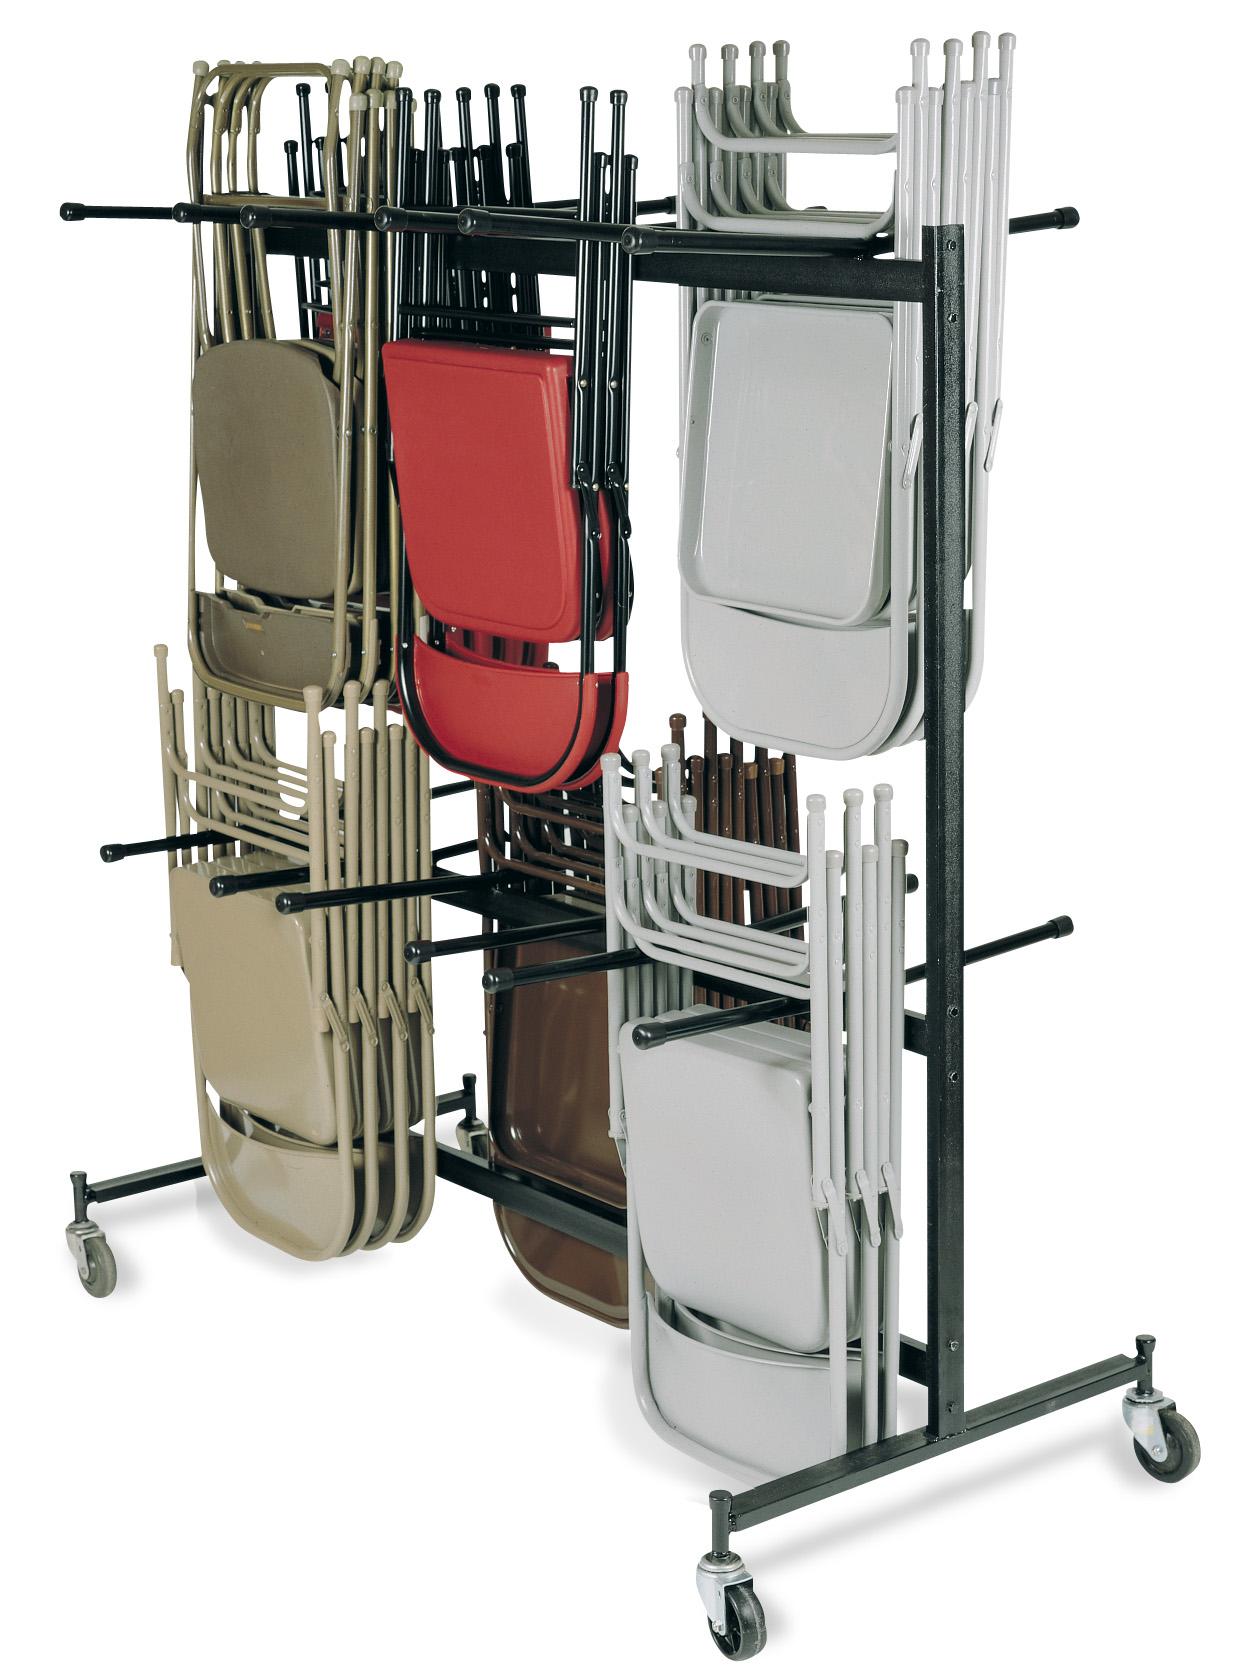 Hanging Chair Cart And Caddies At Handtrucks2go Com